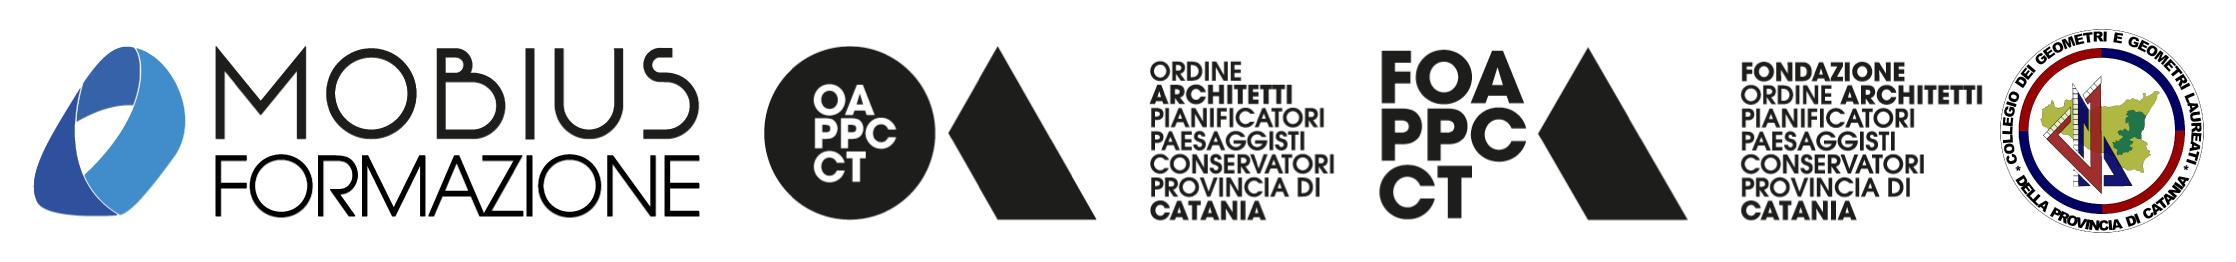 mobius testata strutture Catania